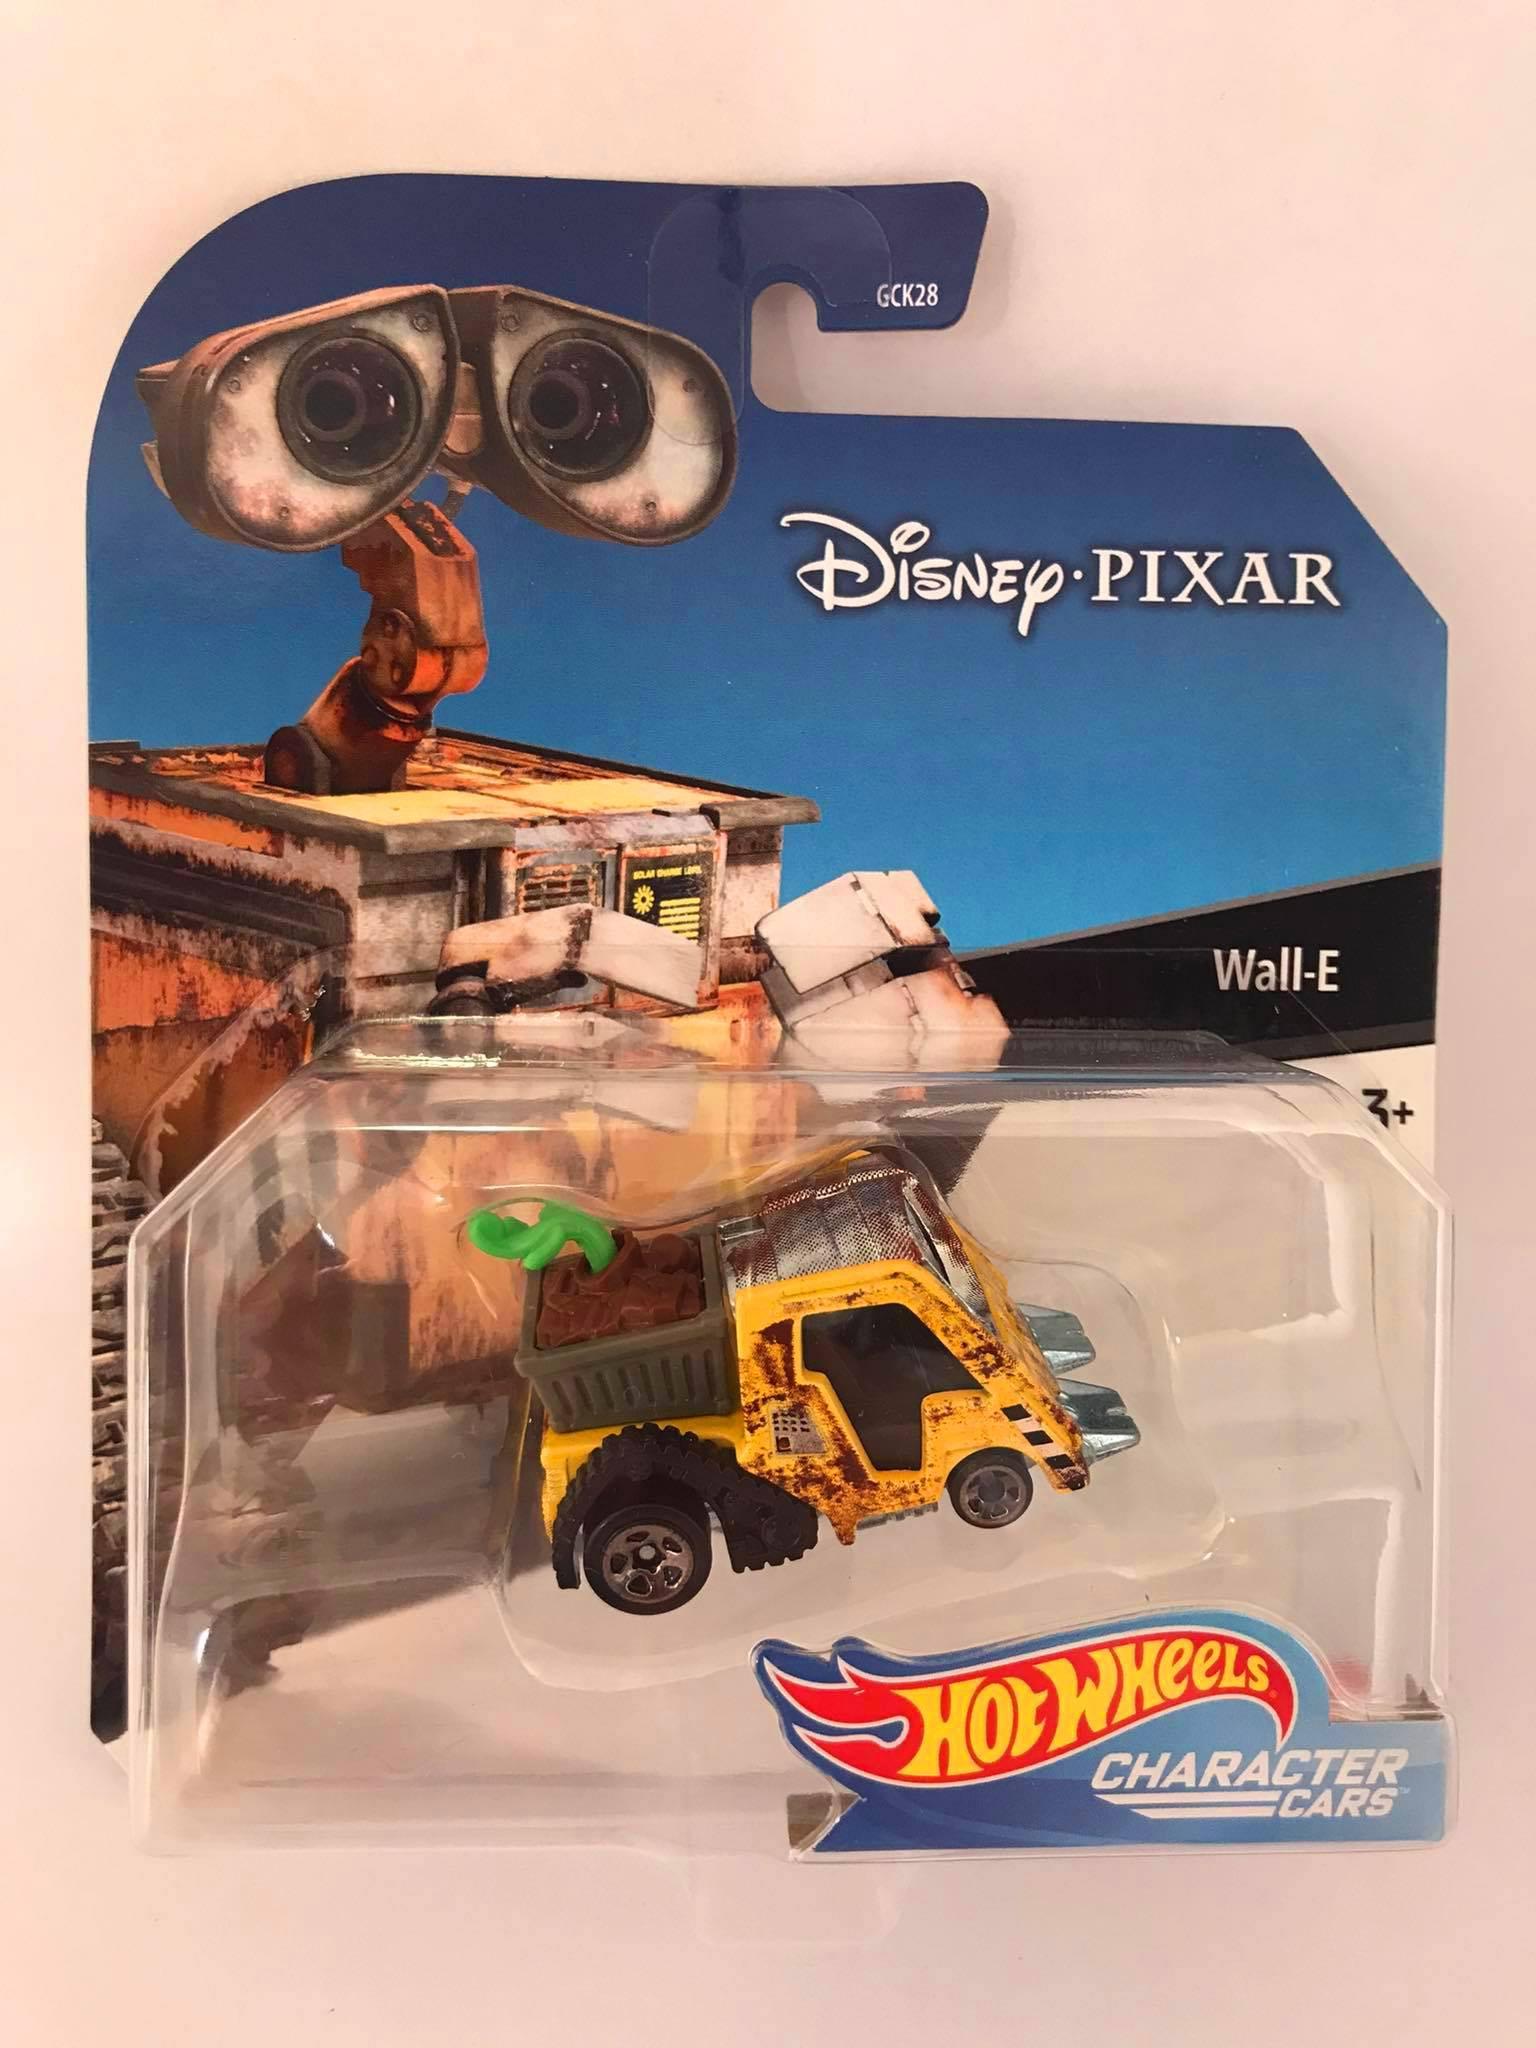 Hot Wheels - Wall-E - Disney Pixar - Character Cars